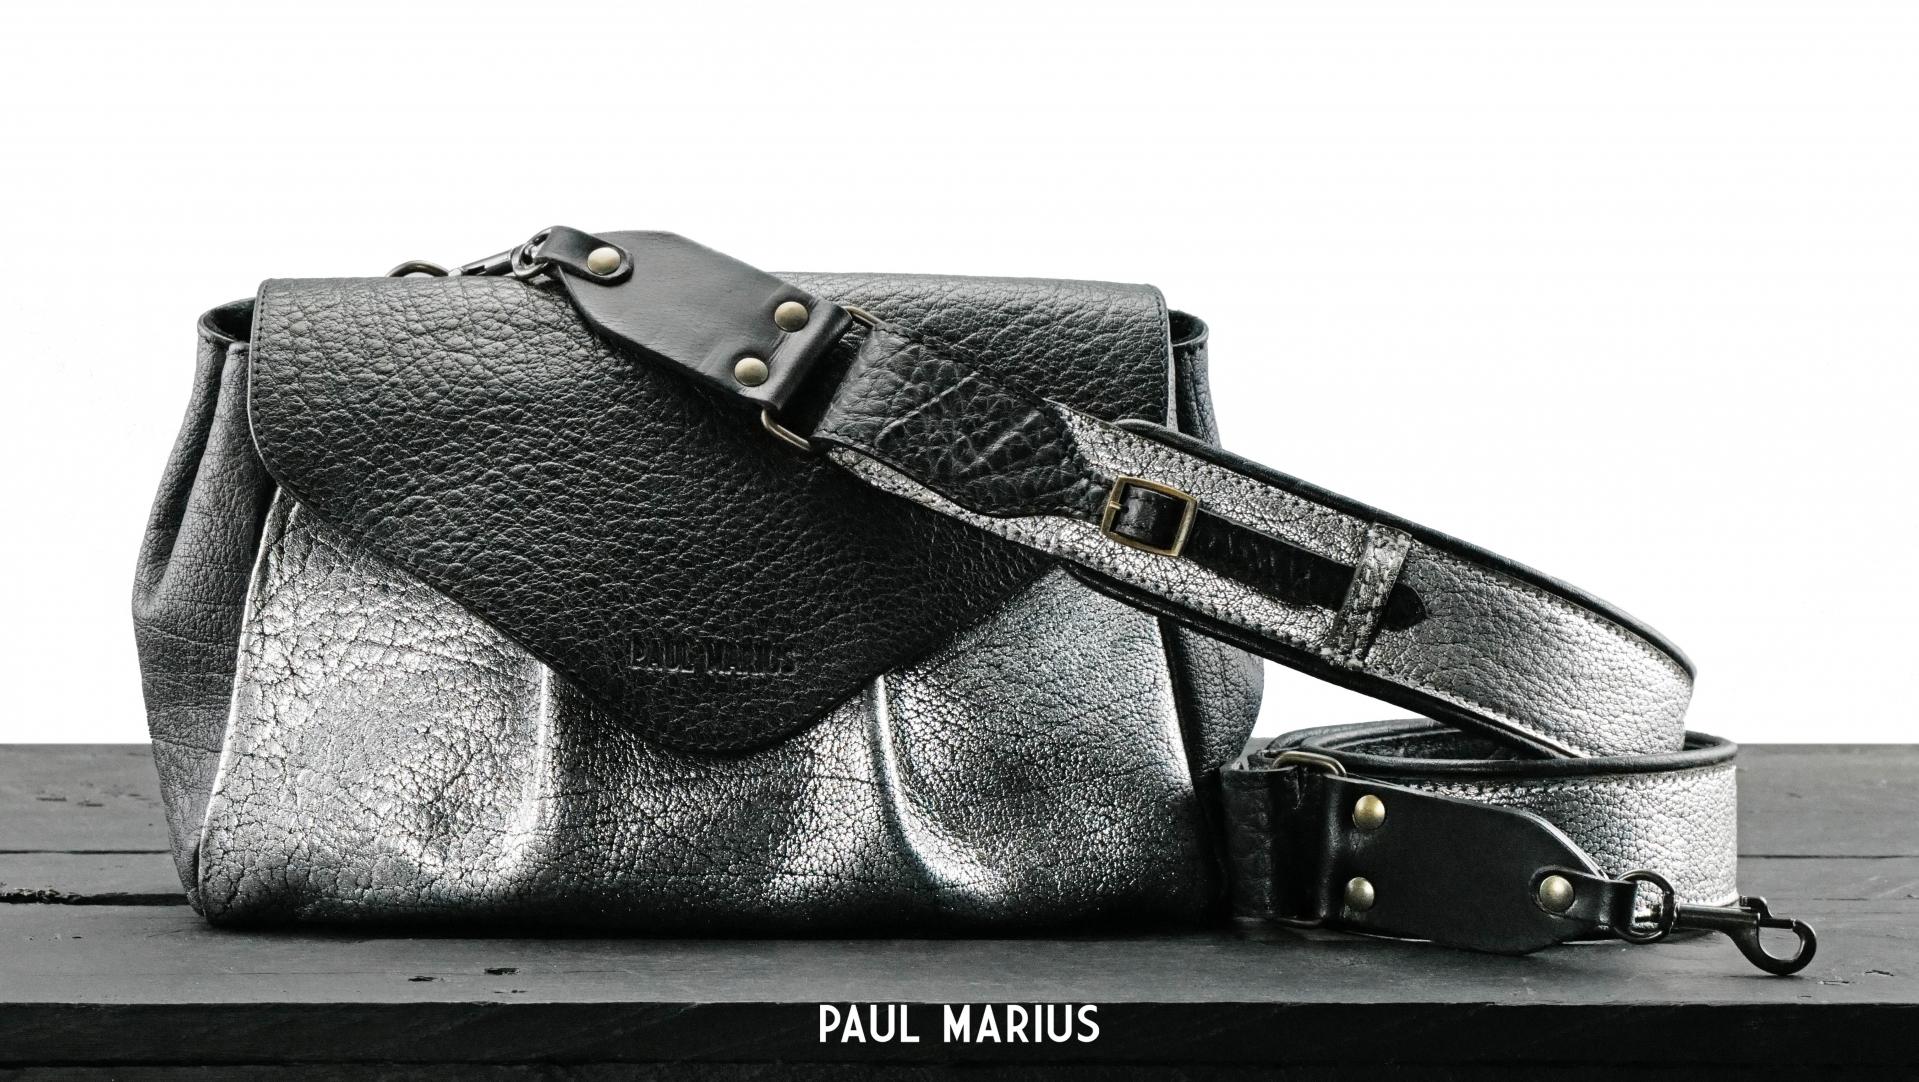 Suzon M - Sac à main cuir femme - Paul Marius